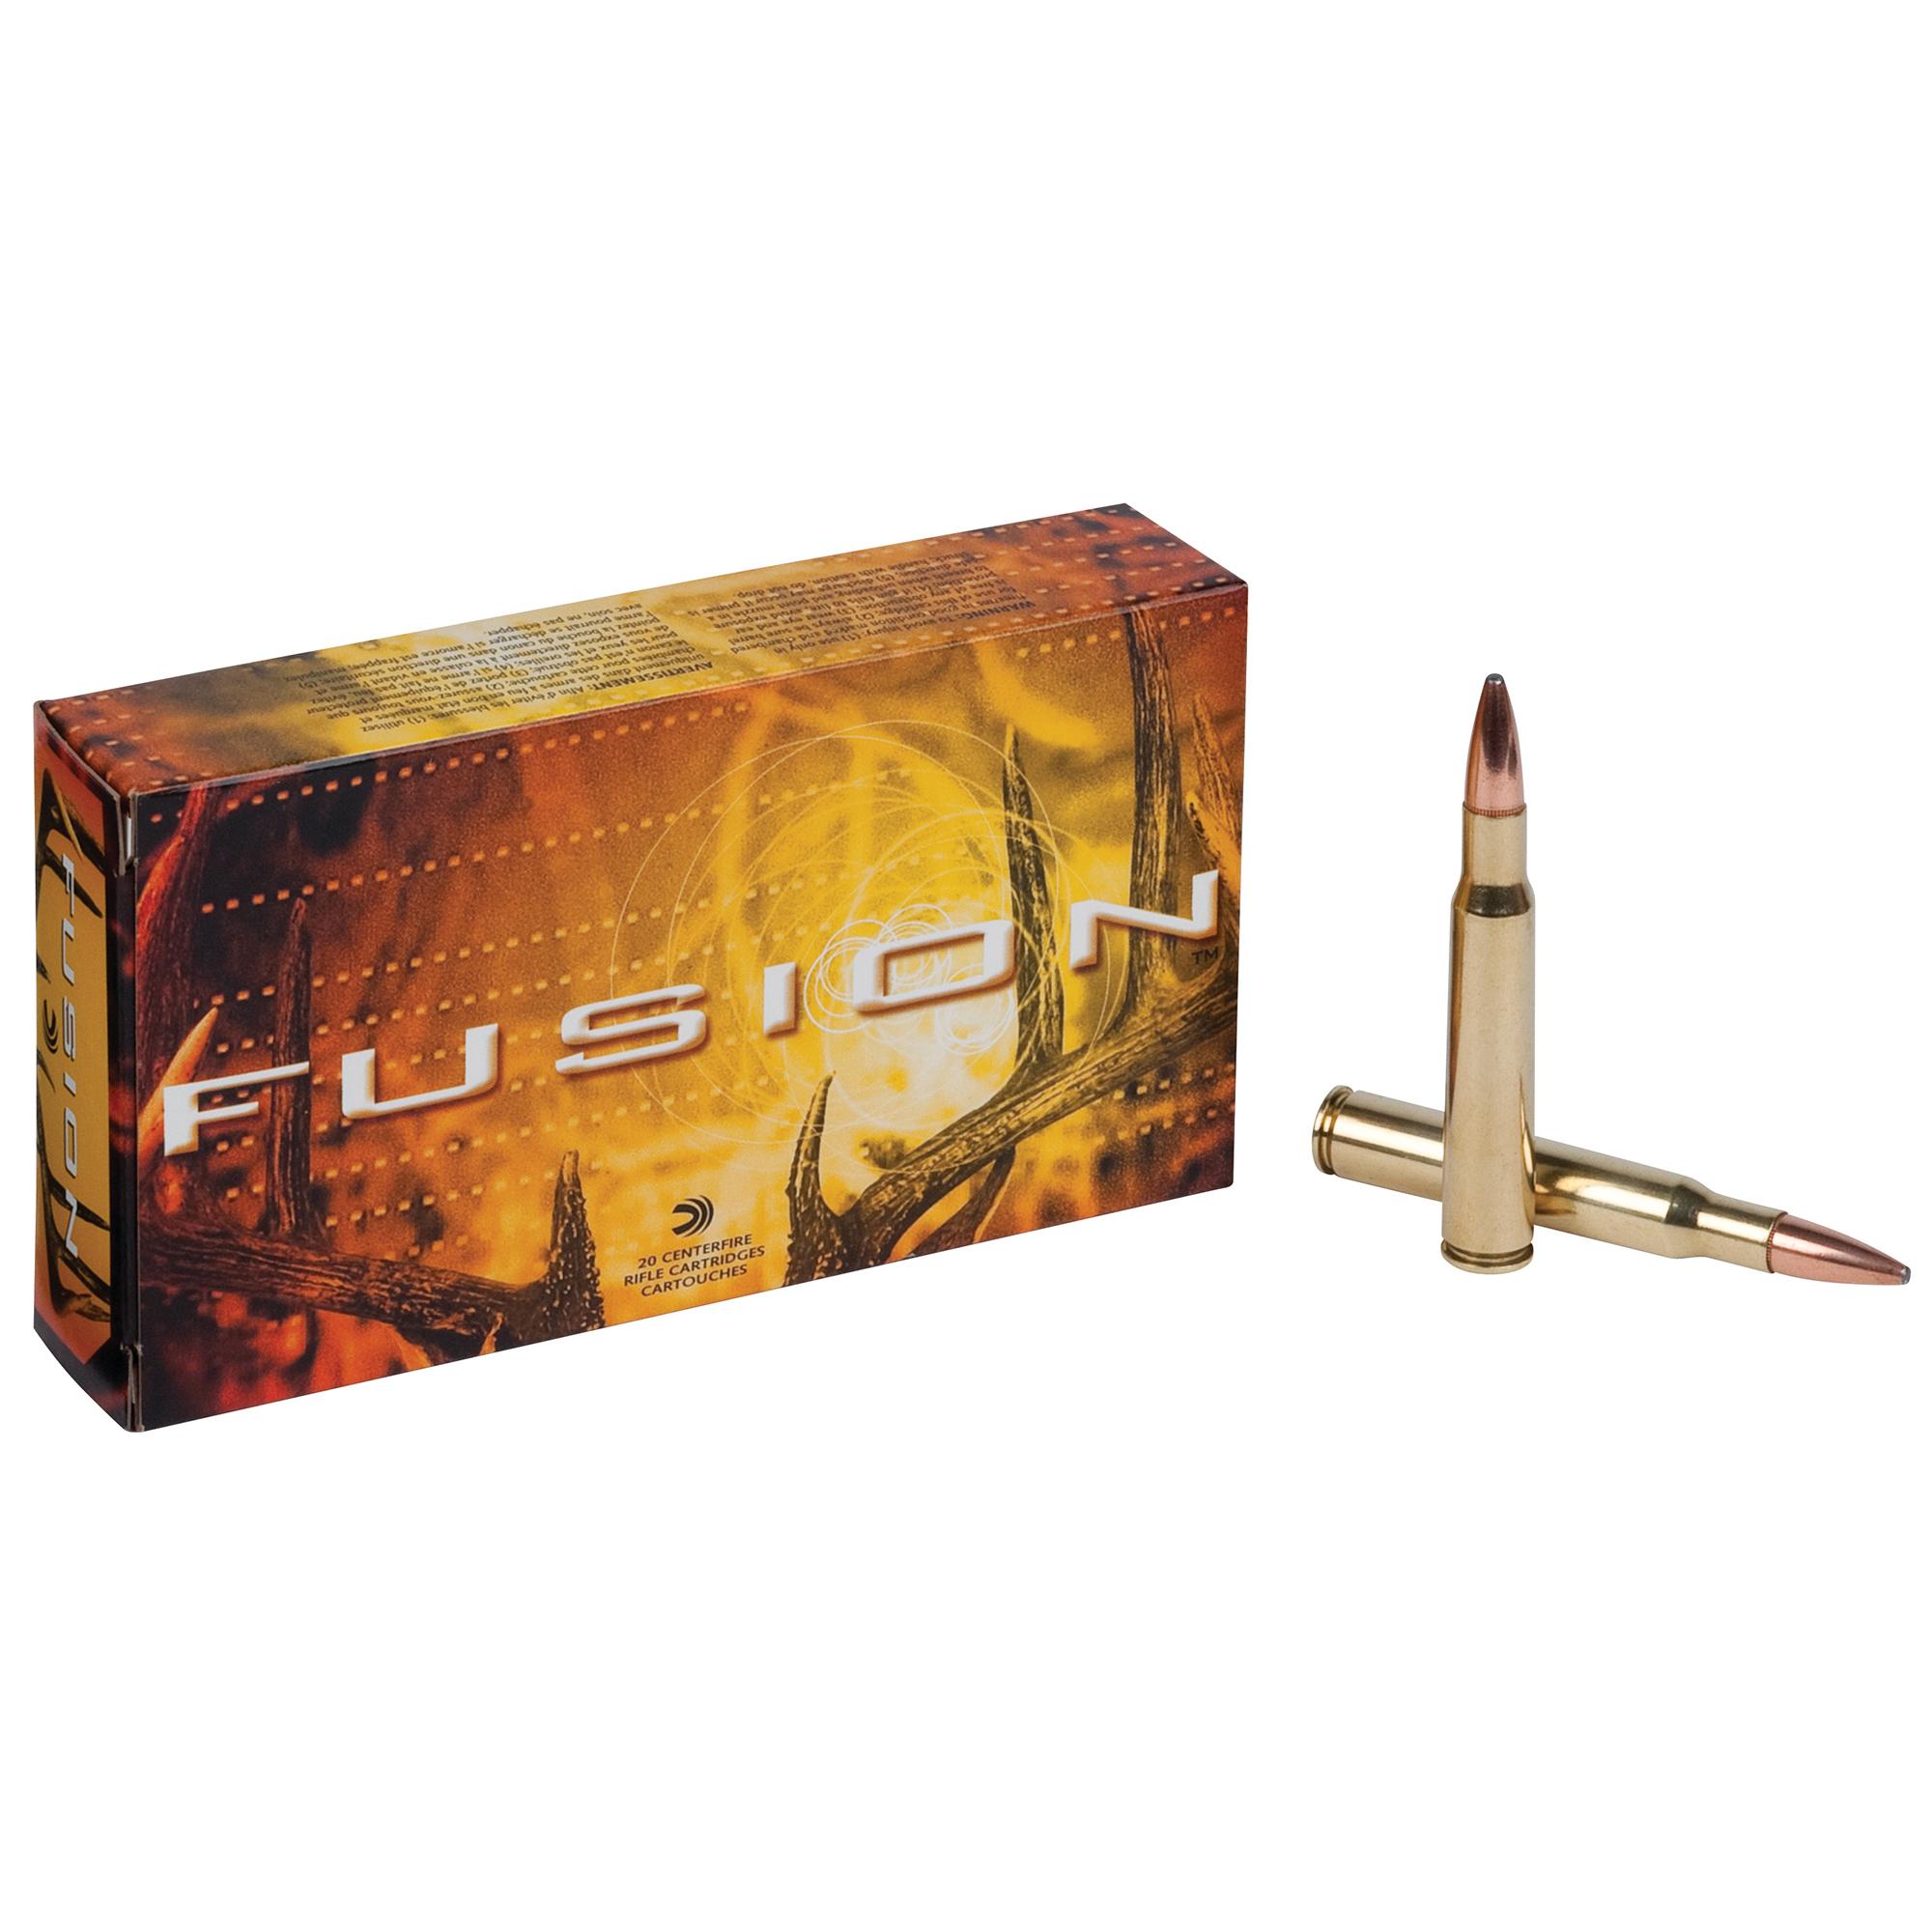 Fusion Rifle Ammunition, 7mm Rem Mag, 150-gr, BTSP